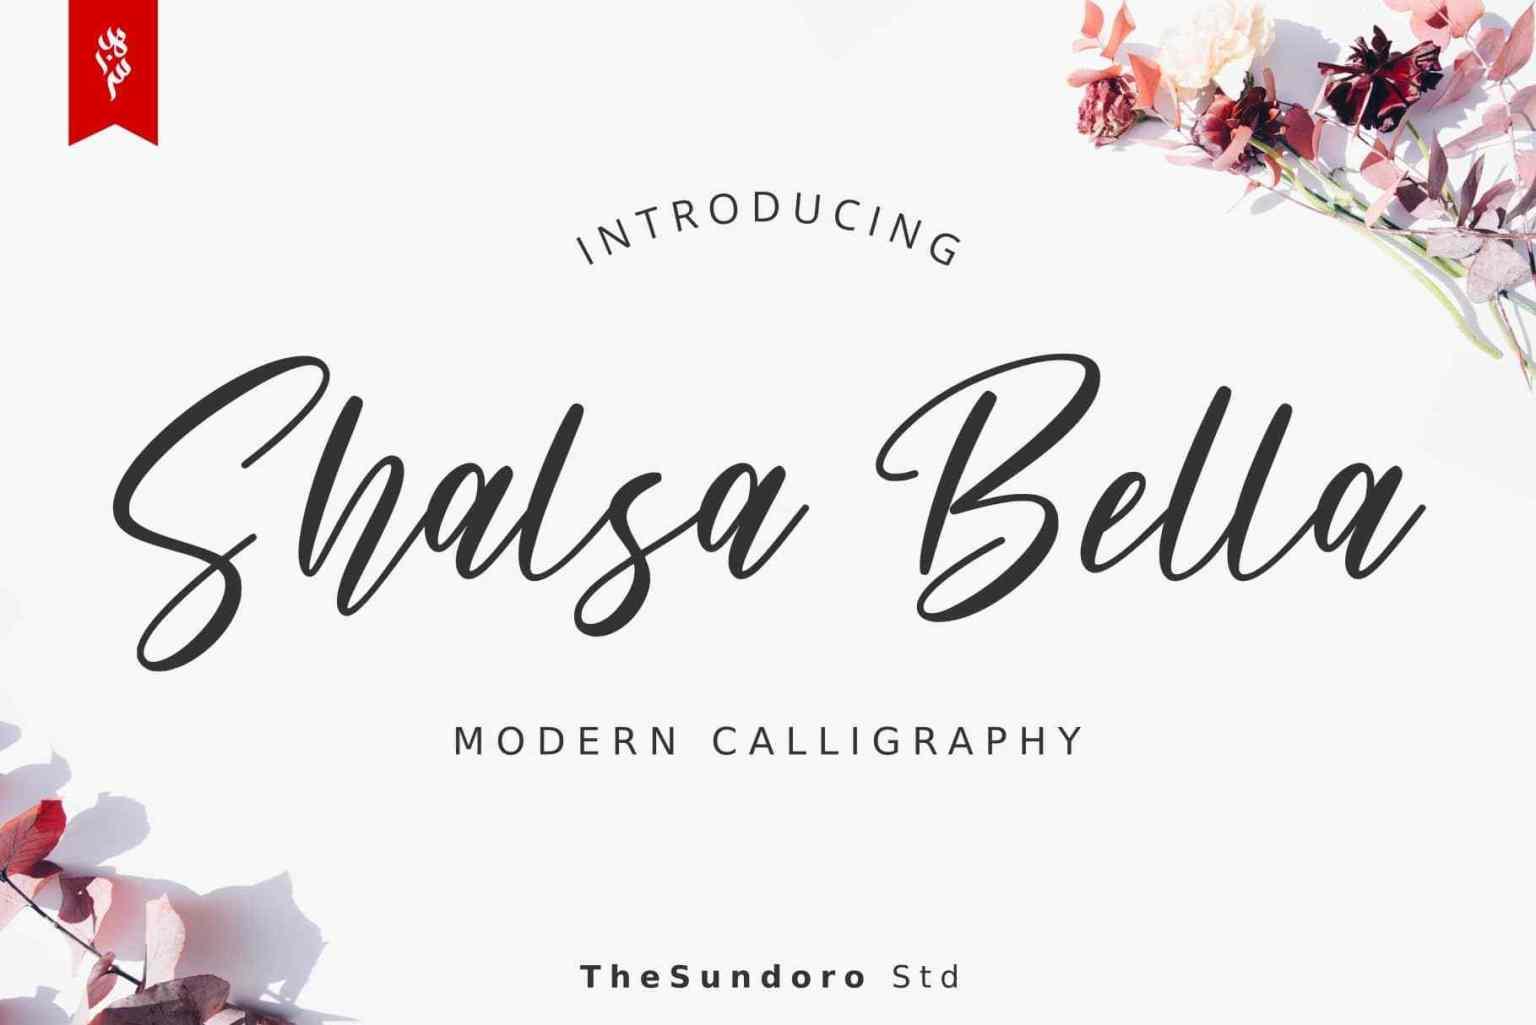 Shalsa-Bella-1 (1)